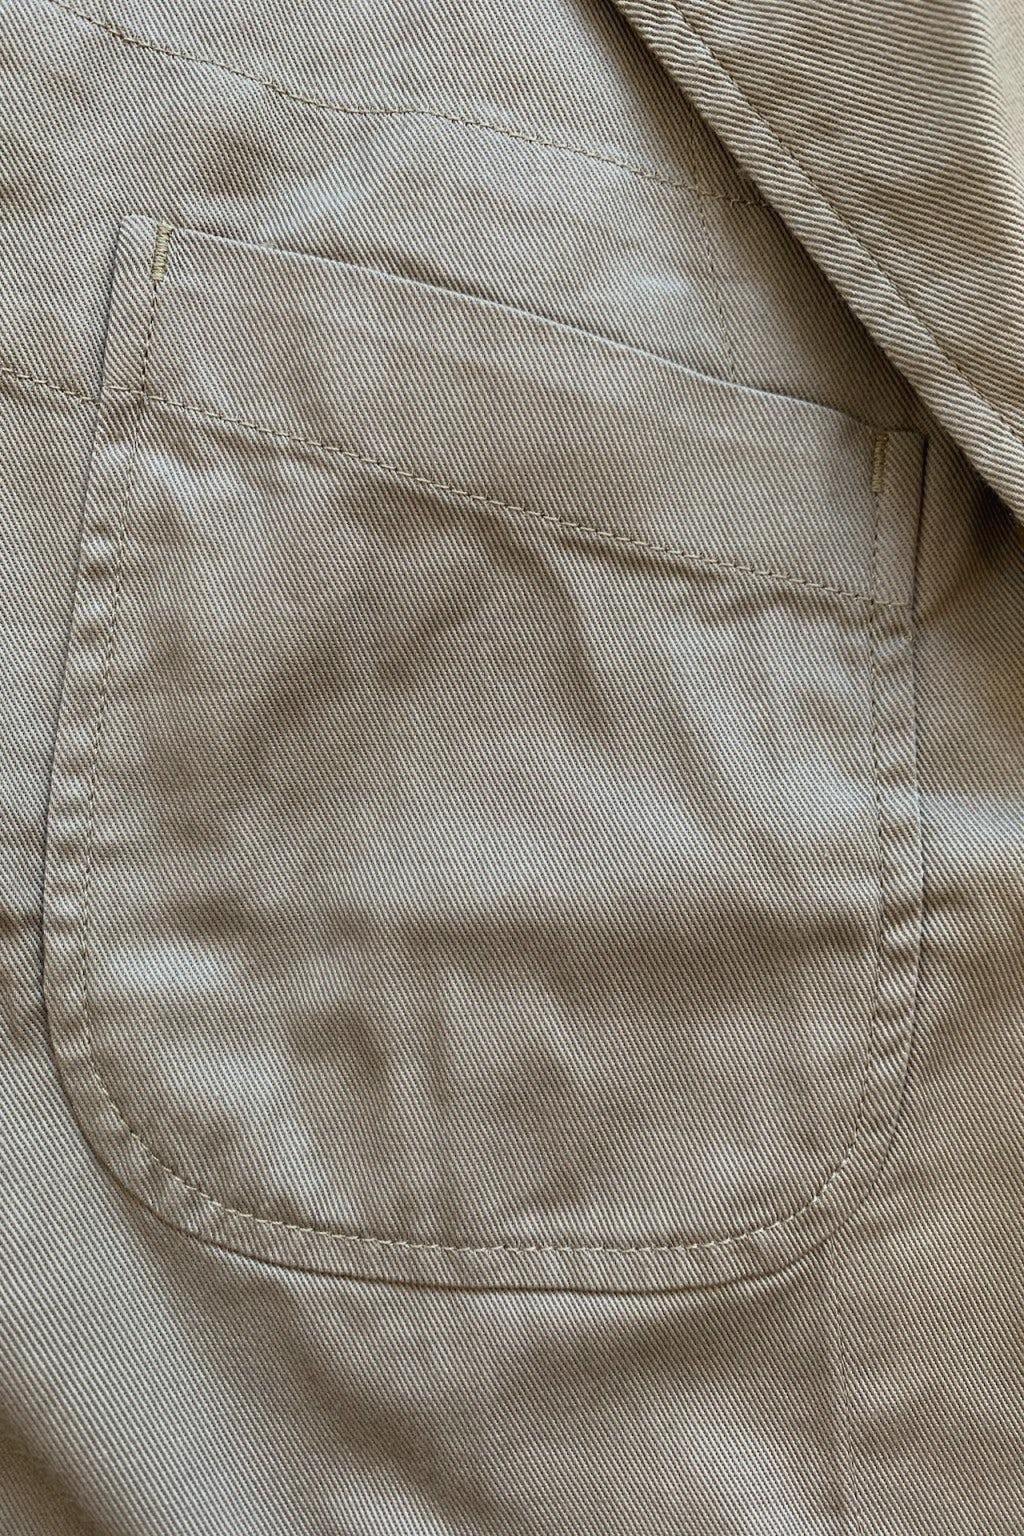 Engineered Garments Bedford Jacket Khaki 6.5oz Flat Twill